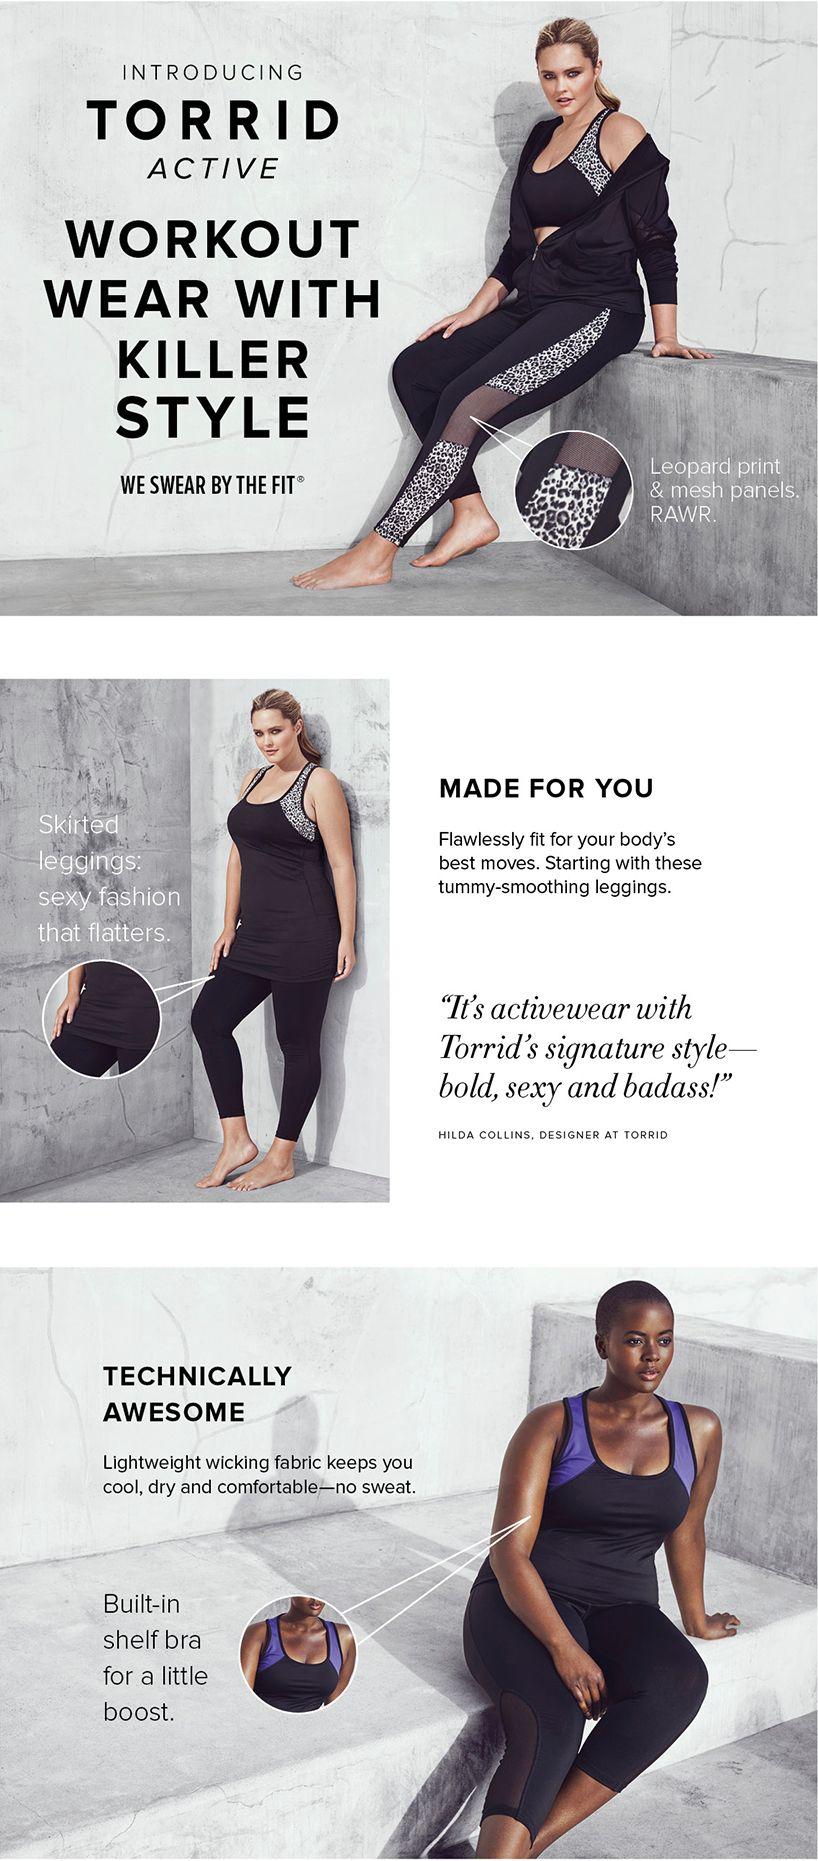 Torrid Shop Trendy Plus Size Clothing Women S Size 12 28 Plus Size Workout Plus Size Fashion Fitness Fashion